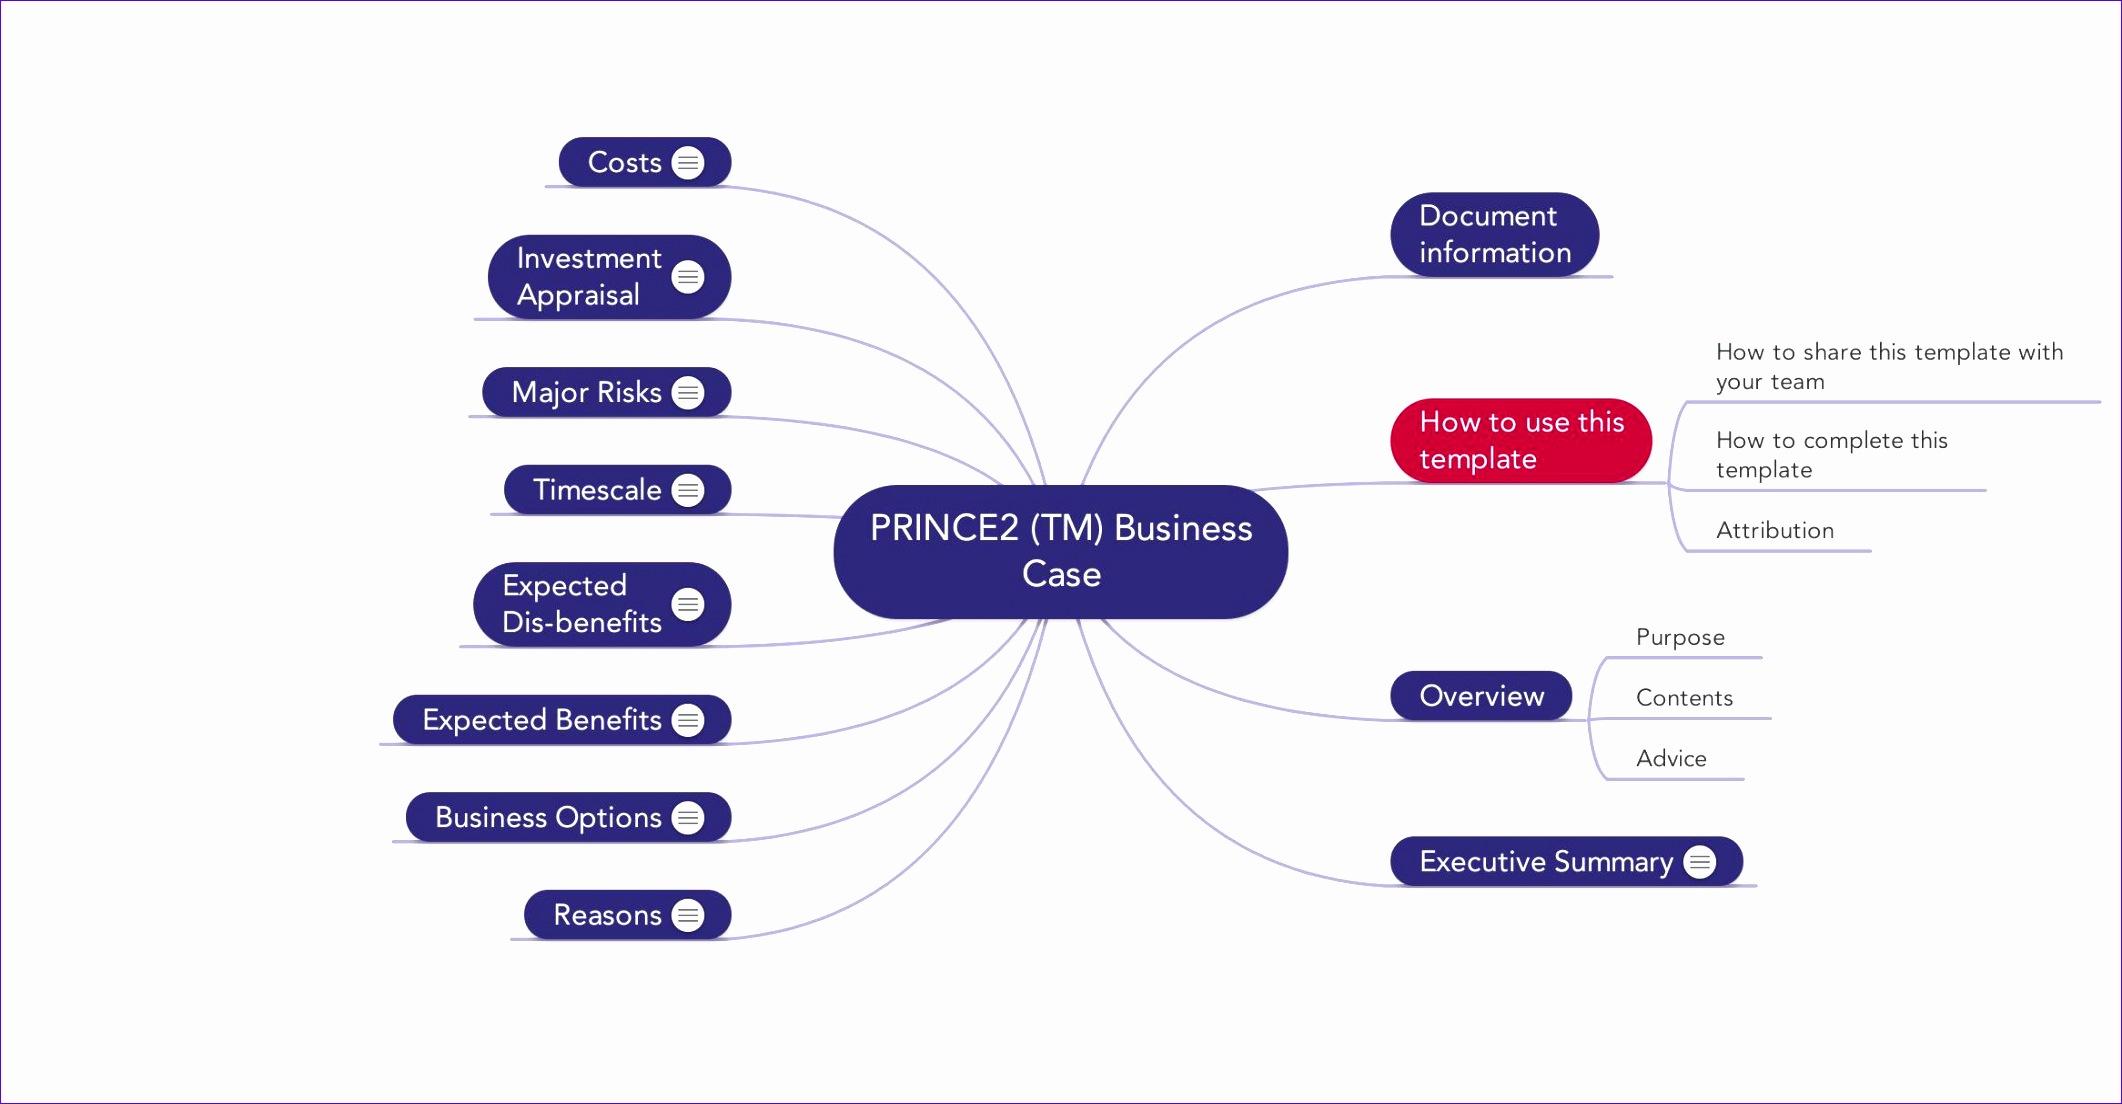 prince 2 templates 21221104